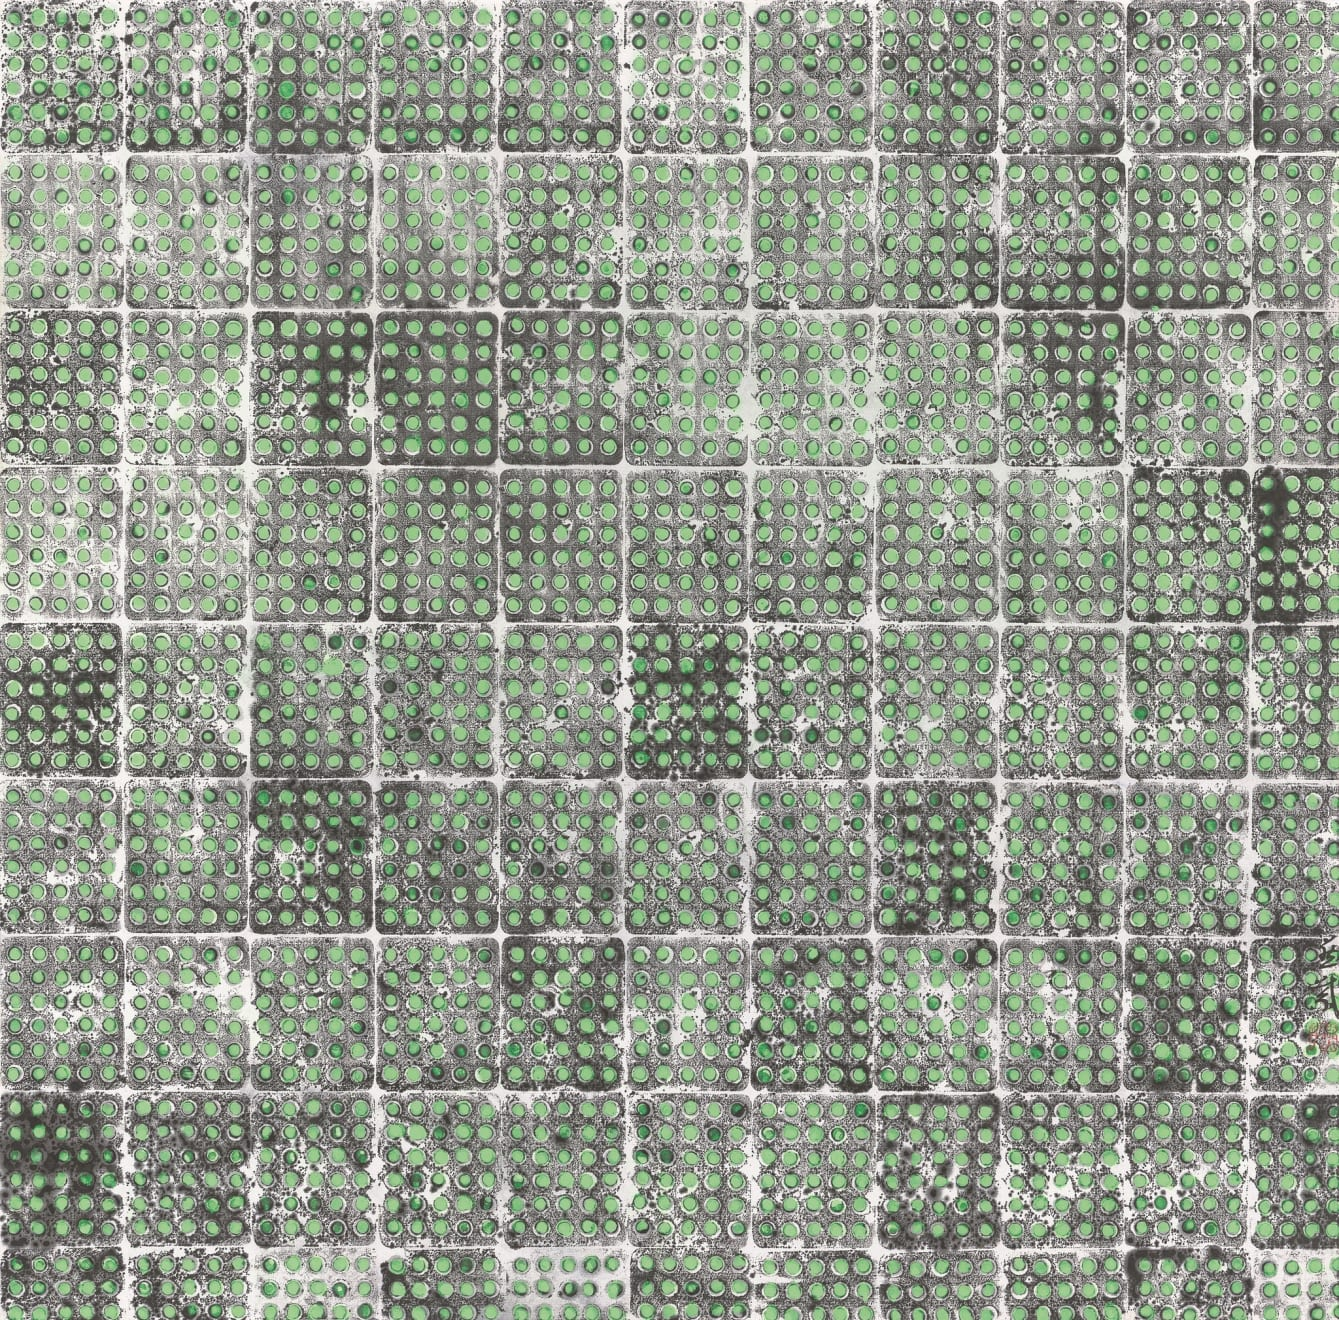 Zhang Yanzi 章燕紫, Medi-Chip 5 空芯片 5, 2016